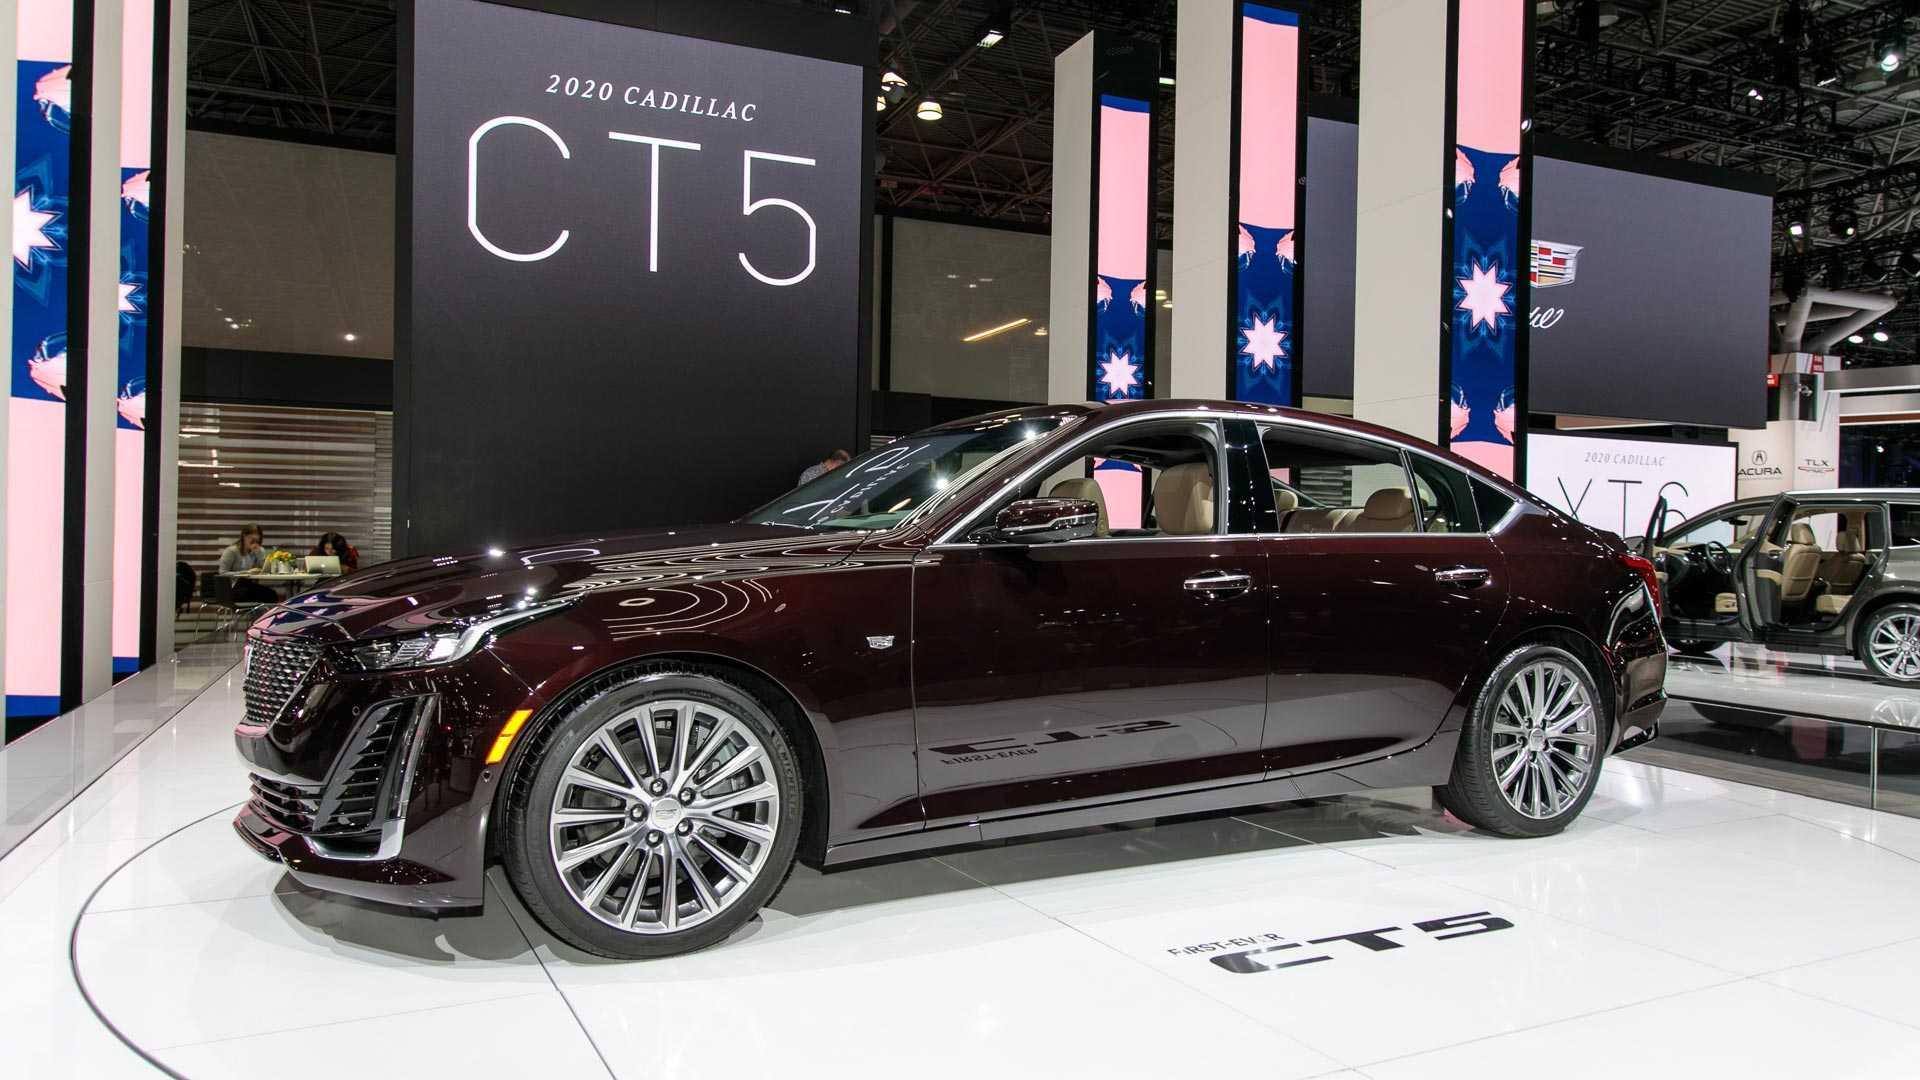 74 New Cadillac New 2020 Rumors with Cadillac New 2020